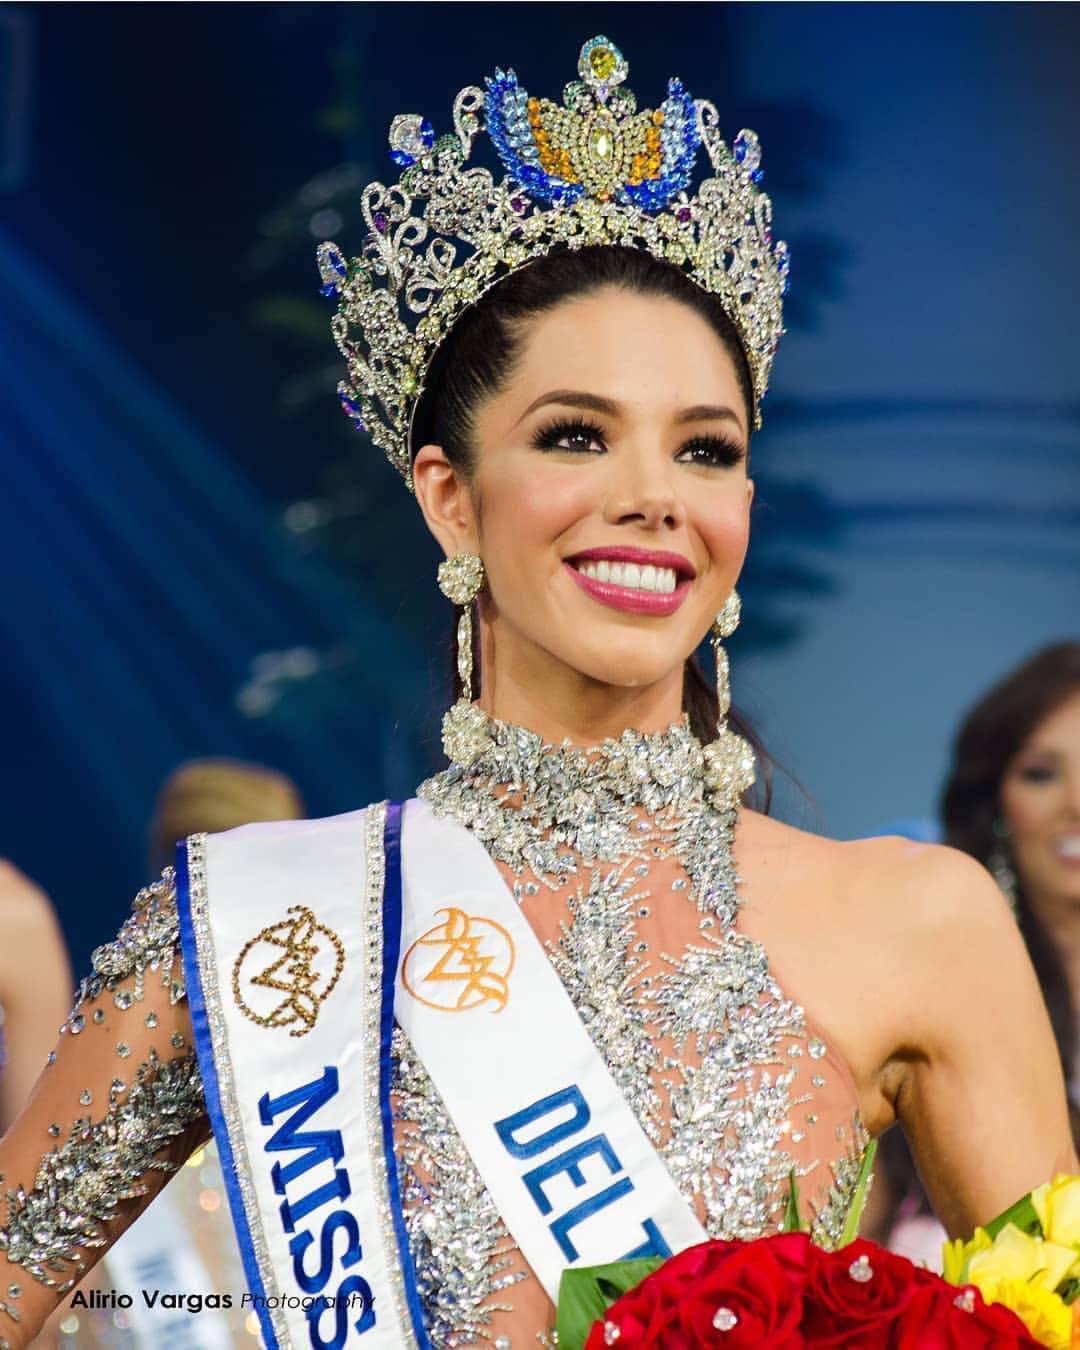 thalia olvino, top 20 de miss universe 2019. - Página 2 67520310